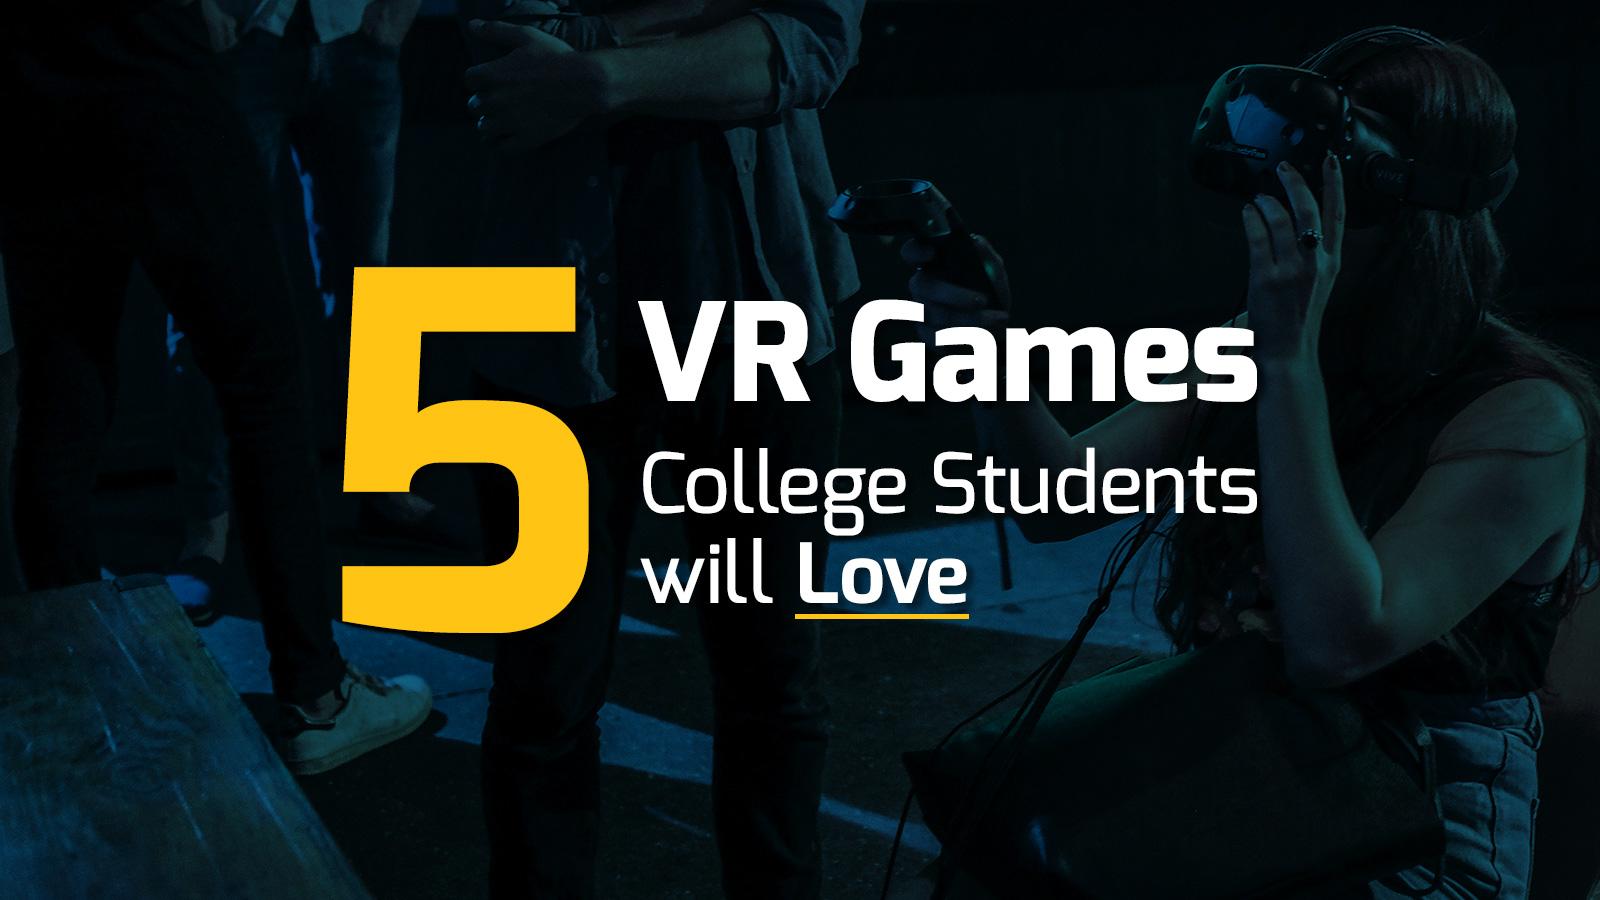 ASVR-5-VR-Games-College-Students-Will-Love-alt.jpg